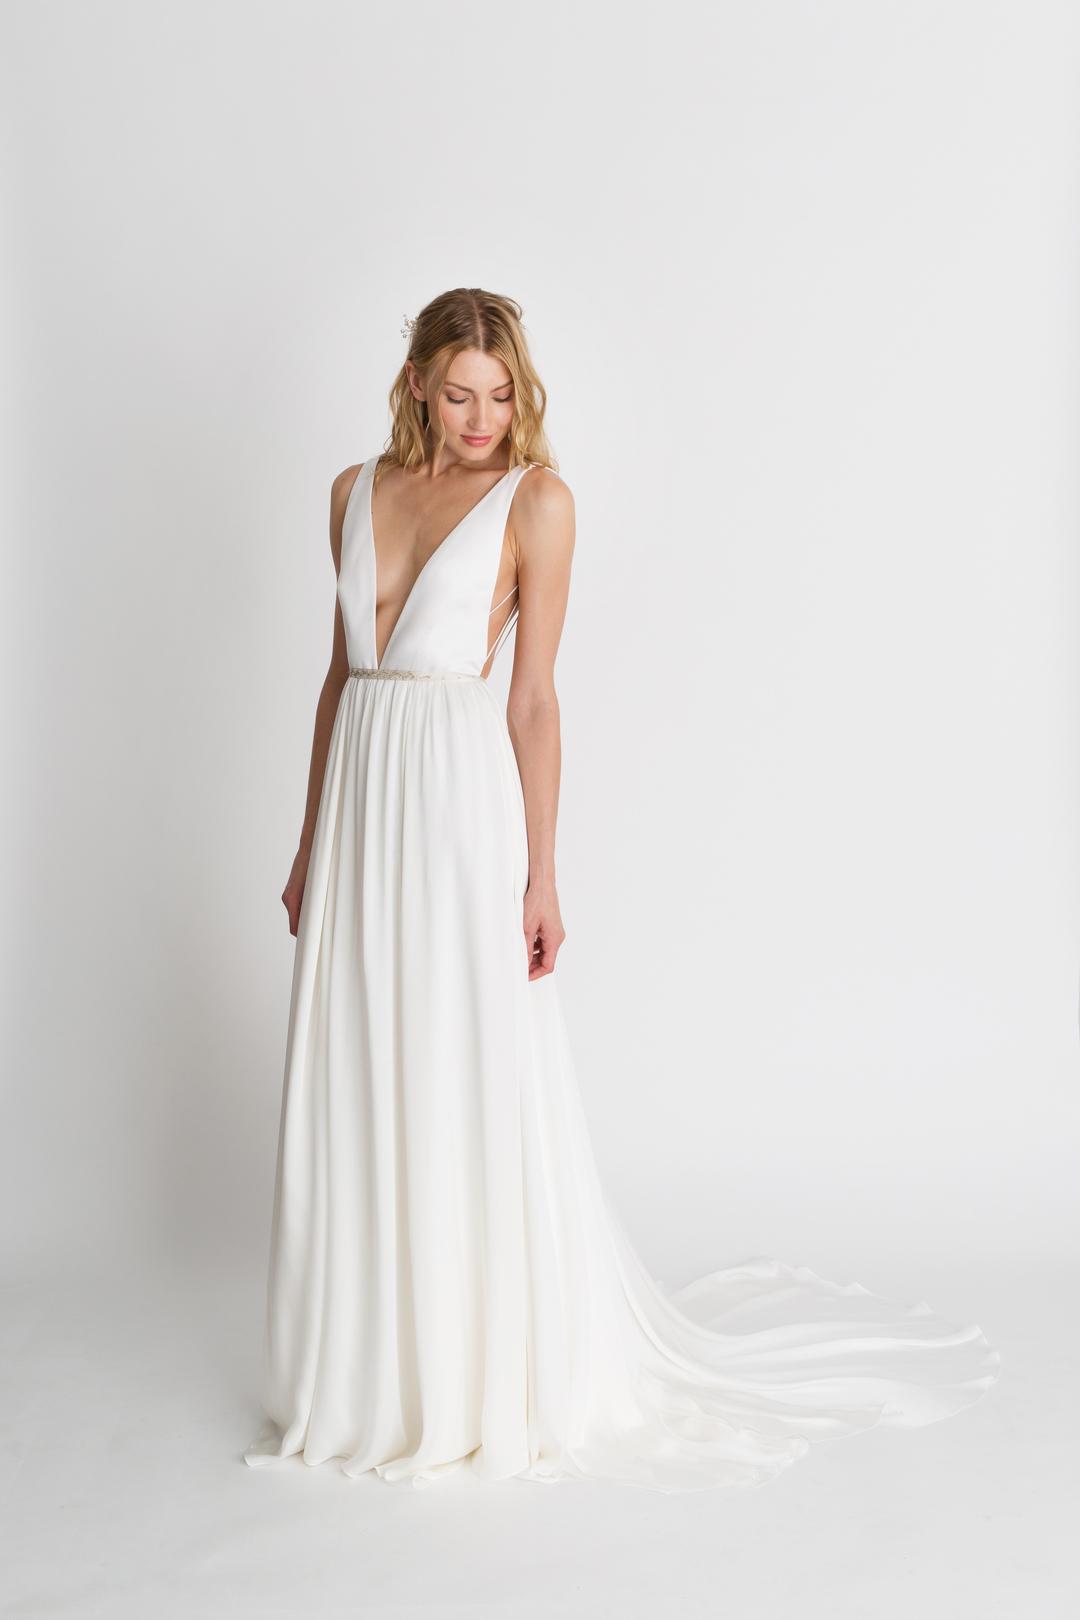 Dress main 2x 1543696587